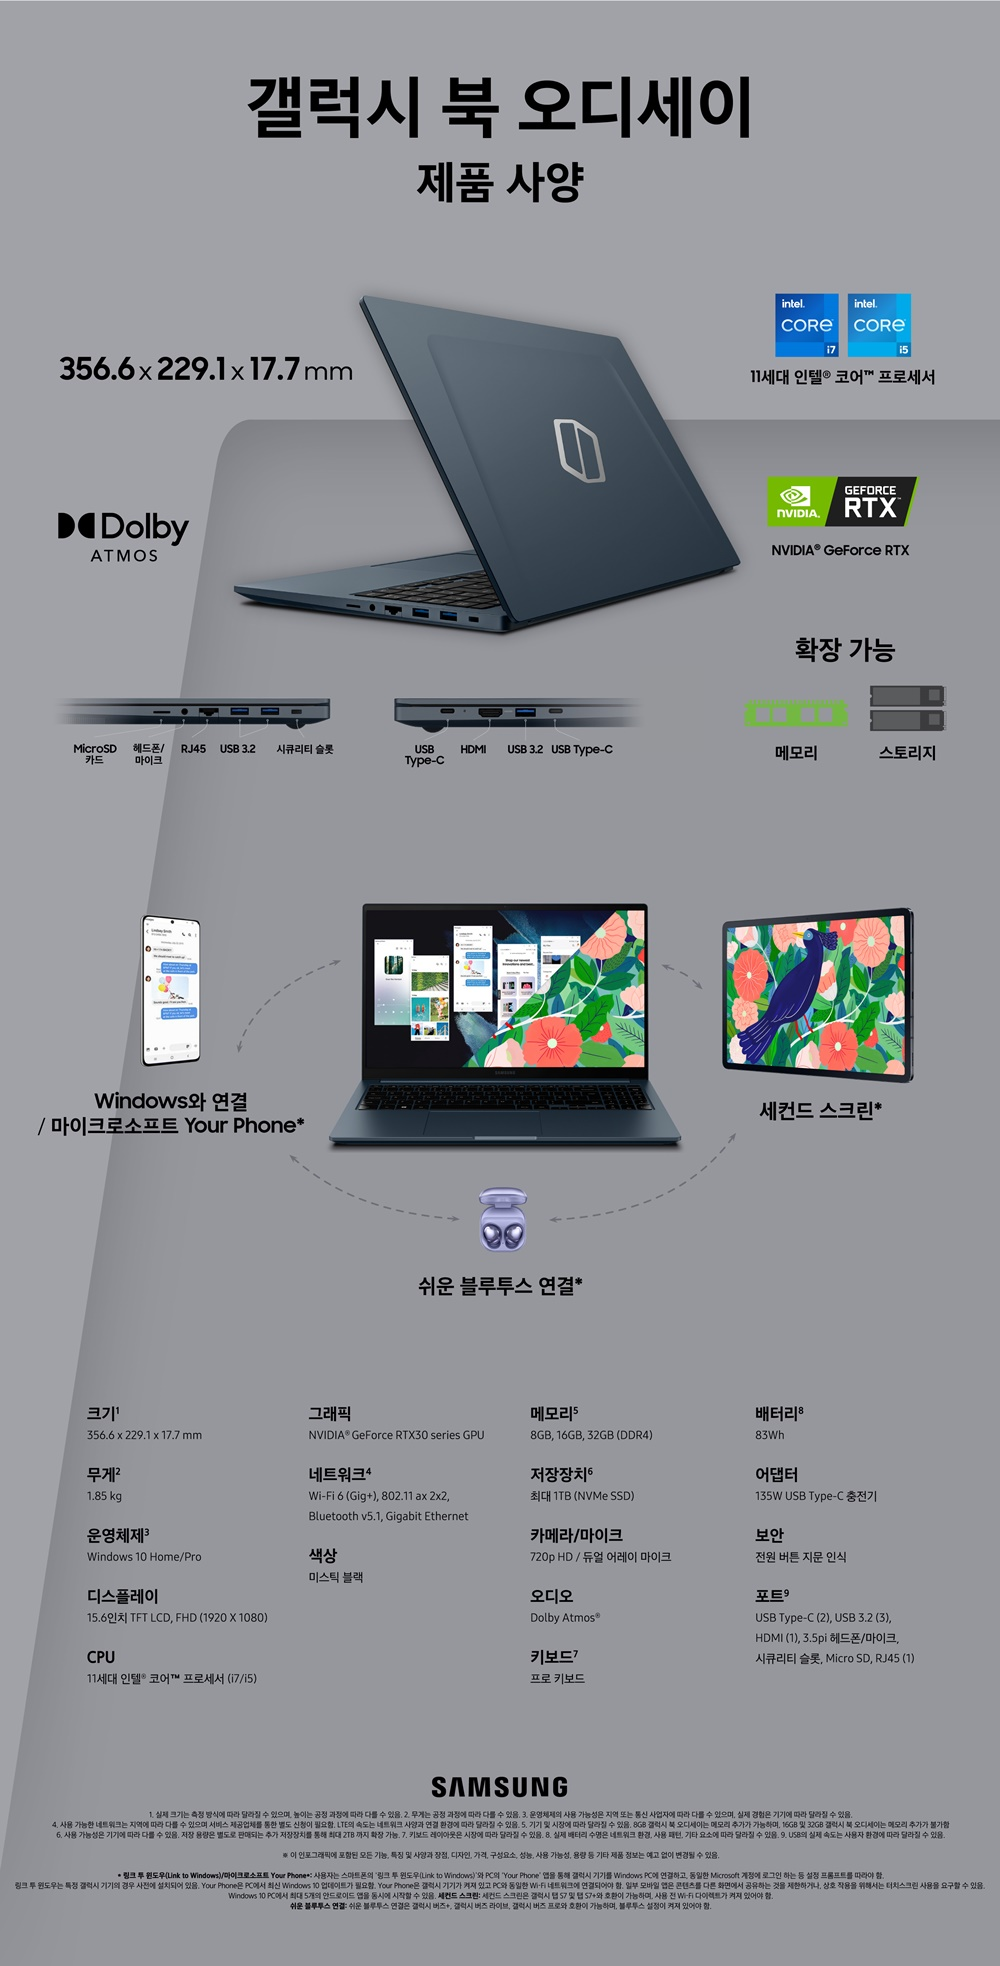 갤럭시 북 오디세이 제품 사양 356.6x229.1x17.7mm Dolby ATMOS NVIDIA GeForce RTX MicroSD 카드 슬롯 헤드폰/마이크 RJ45 USB 3.2 시큐리티 슬롯 USB Type-C HDMI USB 3.2 USB Type-C Intel CORE i7 / i5 11세대 인텔 코어TM 프로세서 확장 가능 메모리 스토리지 Windows와 연결 마이크로소프트 Your Phone 세컨드 스크린 쉬운 블루투스 연결 크기 356.6x229.1x17.7mm 무게 1.85kg 운영체제 windows 10home/pro 디스플레이 15.6인치 TFT LCD, FHD(1920x1080) CPU 11세대 인텔 코어TM 프로세서(i7/i5/) 그래픽 NVIDIA GeForce RTX 3050Ti Max-Q Graphic 네트워크 Wi-Fi 6(Gig+) 802.11 ax 2x2 Bluetooth v5.1, Gigabit Ethernet 색상 미스틱 블랙 메모리 8GB, 16GB, 32GB (DDR4x) 저장장치 최대 1TB(NVMe SSD) 카메라/마이크 720p HD / 듀얼 어레이 마이크 오디오 Dolby Atmos 키보드 프로 키보드 배터리 83wh 어댑터 135W USB Type-C 고속 충전기 보안 전원 버튼 지문 인식 포트 USB Type-C(2) USB 3.2(3) HDMI(1) 3.5pi 헤드폰/마이크, 시큐리티 슬롯, Micro SD, RJ45(1) SAMSUNG 1. 실제 크기는 측정 방식에 따라 달라질 수 있으며, 높이는 공정 과정에 따라 다를 수 있음 2. 무게는 공정 과정에 따라 다를 수 있음 3. 운영체제의 사용 가능성은 지역 또는 통신 사업자에 따라 다를 수 있으며, 실제 경험은 기기에 따라 다를 수 있음 4. 사용 가능한 네트워크는 지역에 따라 다를 수 있으며 서비스 제공업체를 통한 별도 신청이 필요함. LTE의 속도는 네트워크 사양과 연결 환경에 따라 달라질 수 있음 5. 기기 및 시장에 따라 달라질 수 있음. 8GB 갤럭시 북 오디세이는 메모리 추가가 가능하며 16GB 및 32GB 갤럭시 북 오디세이는 메모리 추가가 불가함 6. 사용가능성은 기기에 따라 다를 수 있음. 저장 용량은 별도 판매되는 추가 저장장치를 통해 최대 2TB까지 확장 가능 7. 키보드 레이아웃은 시장에 따라 달라질 수 있음 8. 실제 배터리 수명은 네트워크 환경, 사용 패턴, 기타 요소에 따라 달라질 수 있음9. USB의 실제 속도는 사용자 환경에 따라 달라질 수 있음 *이 인포그래픽에 포함된 모든 기능, 특징 및 사양과 장점, 디자인, 가격, 구성요소, 성능, 사용 가능성, 용량 등 기타 제품 정보는 예고없이 변경될 수 있음 *링크 투 윈도우(Link to Windows)/ 마이크로소프트 Youre Phone*: 사용자는 스마트폰의 링크 투 윈도우(Link to Windows)와 PC의 Youre Phone 앱을 통해 갤럭시 기기를 Windows PC에 연결하고, 동일한 Microsoft 계정에 로그인 하는 등 설정 프롬포트를 따라야 함. 링크 투 윈도우는 특정 갤럭시 기기의 경우 사전에 설치되어 있음. Youre Phone은 PC에서 최신 Windows 10 업데이트가 필요함. Youre Phone은 갤럭시 기기가 켜져 있고 PC와 동일한 Wi-Fi 네트워크에 연결되어야 함. 일부 모바일 앱은 콘텐츠를 다른 화면에서 공유하는 것을 제한하거나, 상호 작용을 위해서는 터치스크린 사용을 요구할 수 있음. Windows 10 PC에서 최대 5개의 안드로이드 앱을 동시에 시작할 수 있음. 세컨드 스크린: 세컨드 스크린은 갤럭시 탭 S7 및 탭 S7+와 호환이 가능하며, 사용 전 Wi-Fi 다이렉트가 켜져 있어야 함. 쉬운 블루투스 연결: 쉬운 블루투스 연결은 갤럭시 버즈+, 갤럭시 버즈 라이브, 갤럭시 버즈 프로와 호환이 가능하며, 블루투스 설정이 켜져 있어야 함.